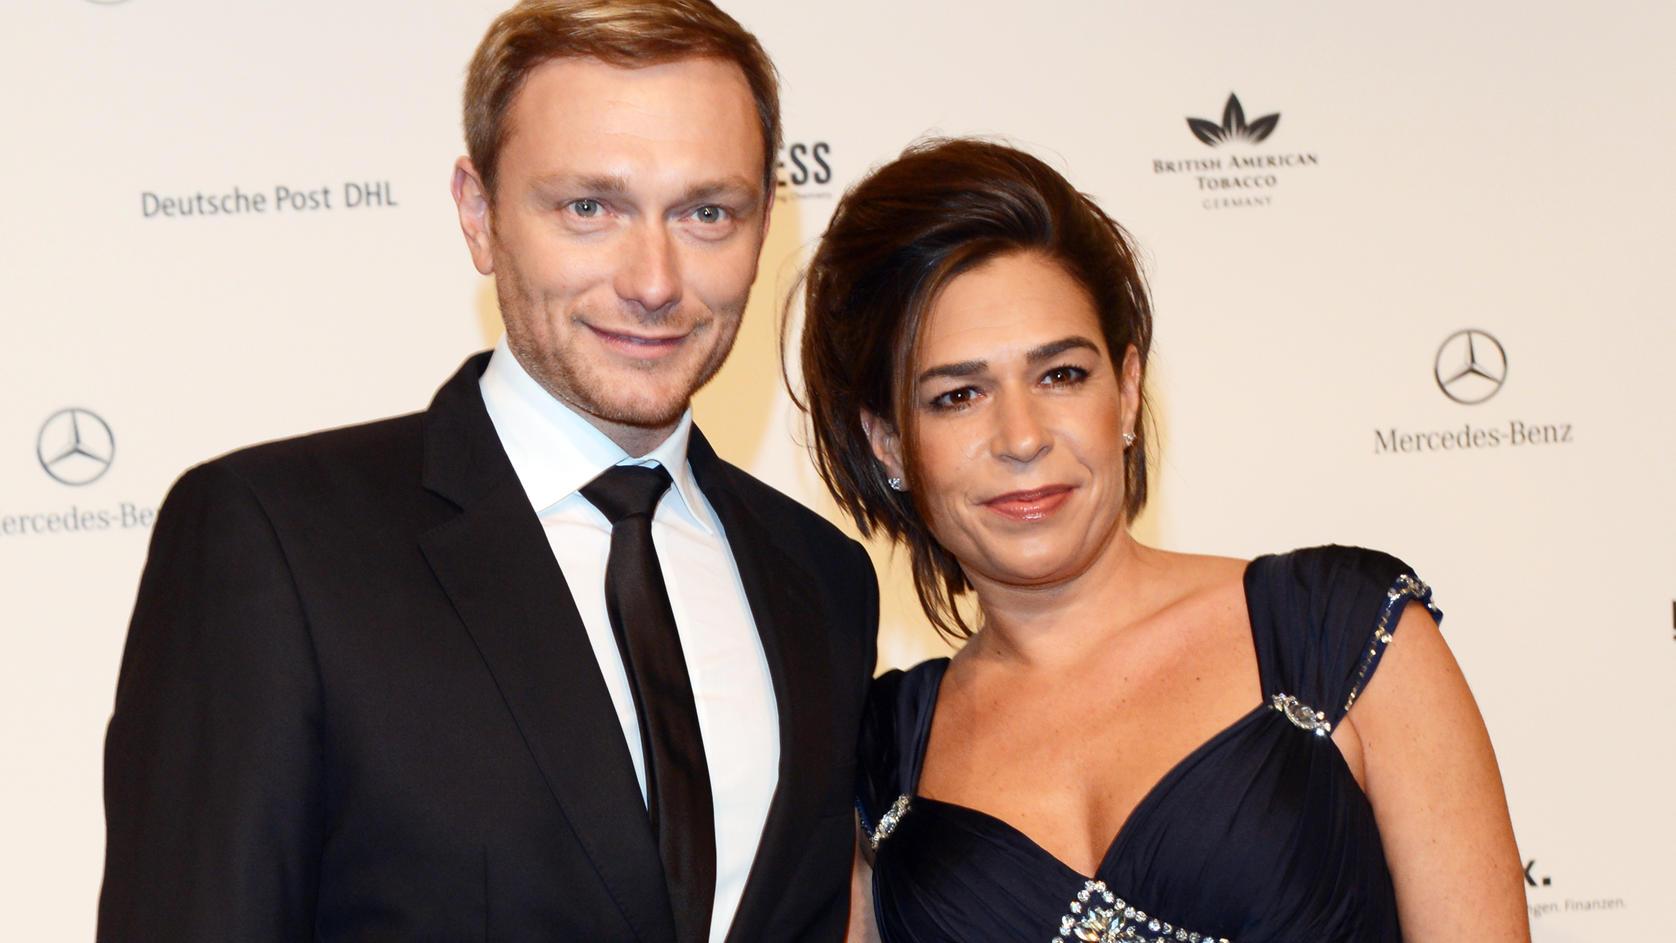 Christian Lindner und Dagmar Rosenfeld: Ehe-Aus nach